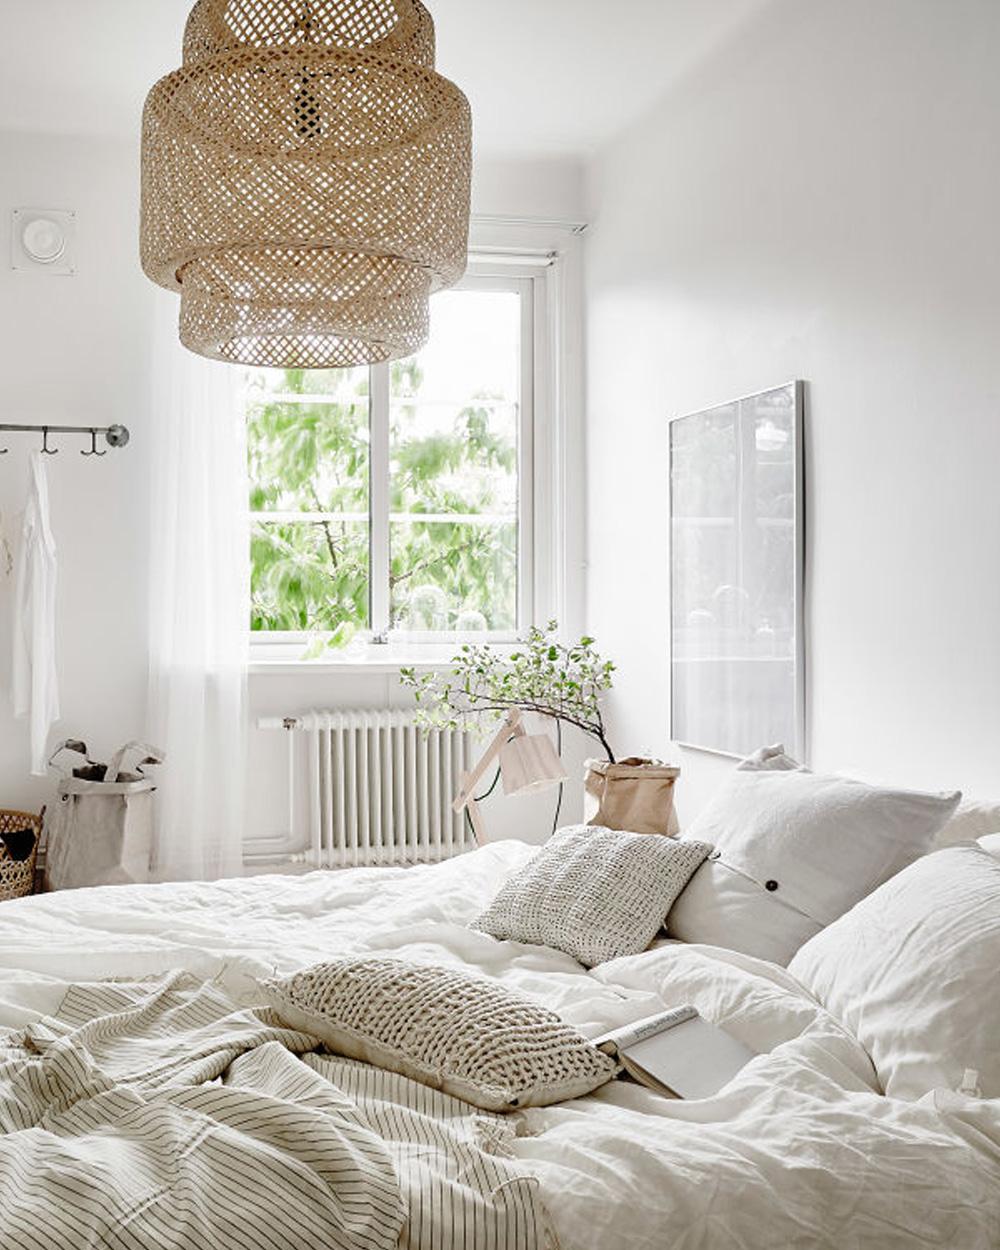 10 astuces pour gagner en luminosit naturelle dans votre chambre shake my blog. Black Bedroom Furniture Sets. Home Design Ideas